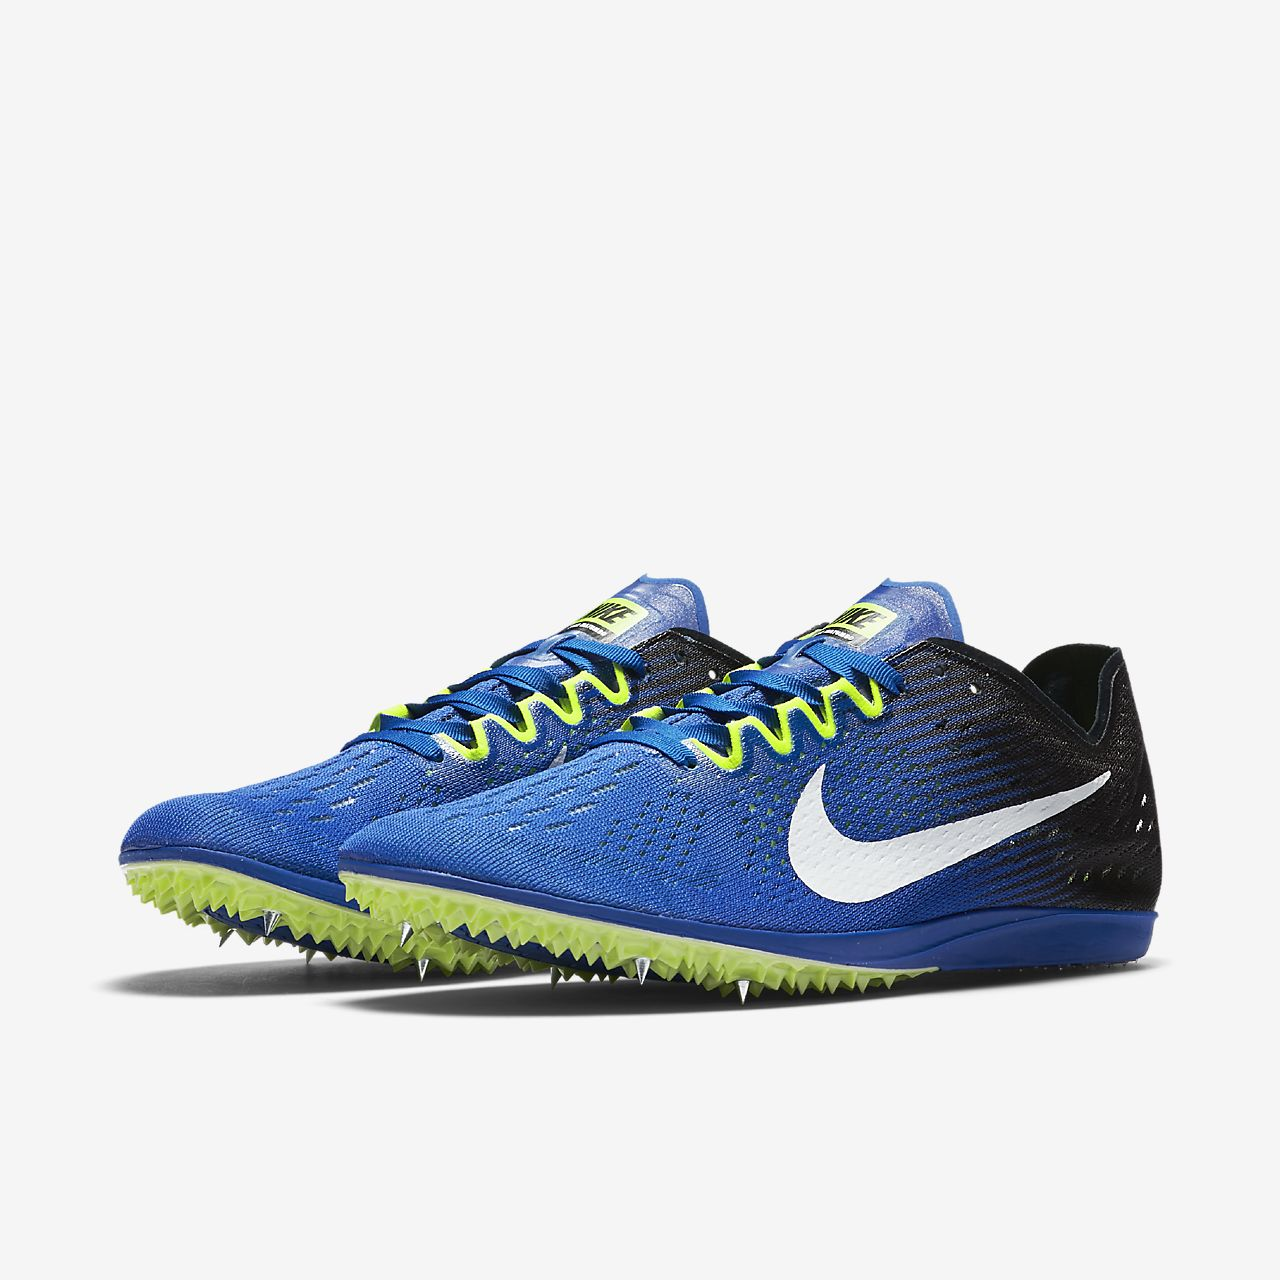 336db5d26c9b Nike Zoom Matumbo 3 Unisex Distance Spike. Nike.com GB